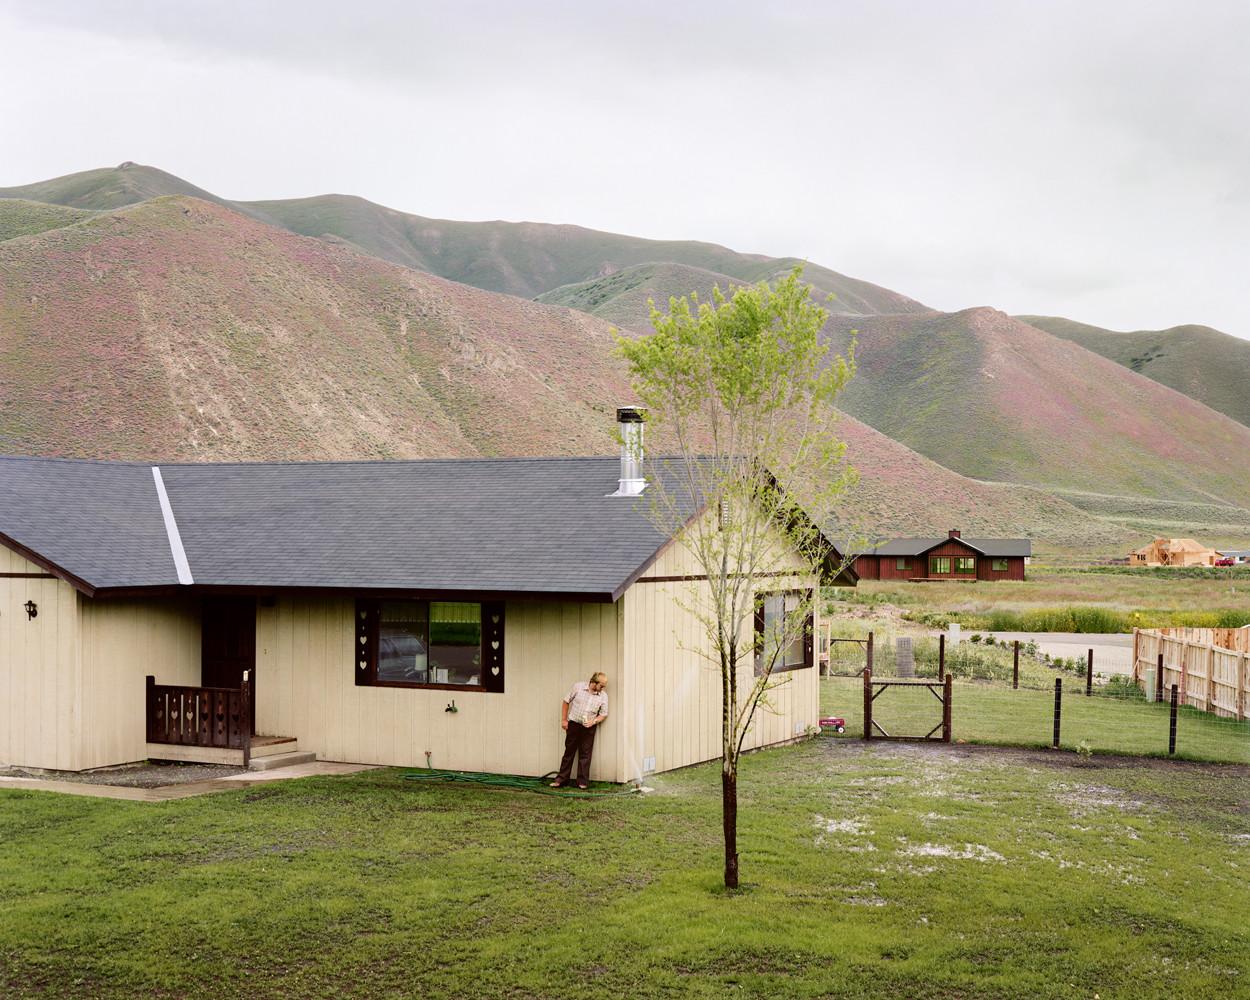 Joel Sternfeld, 'Hailey, Idaho, June', 1980